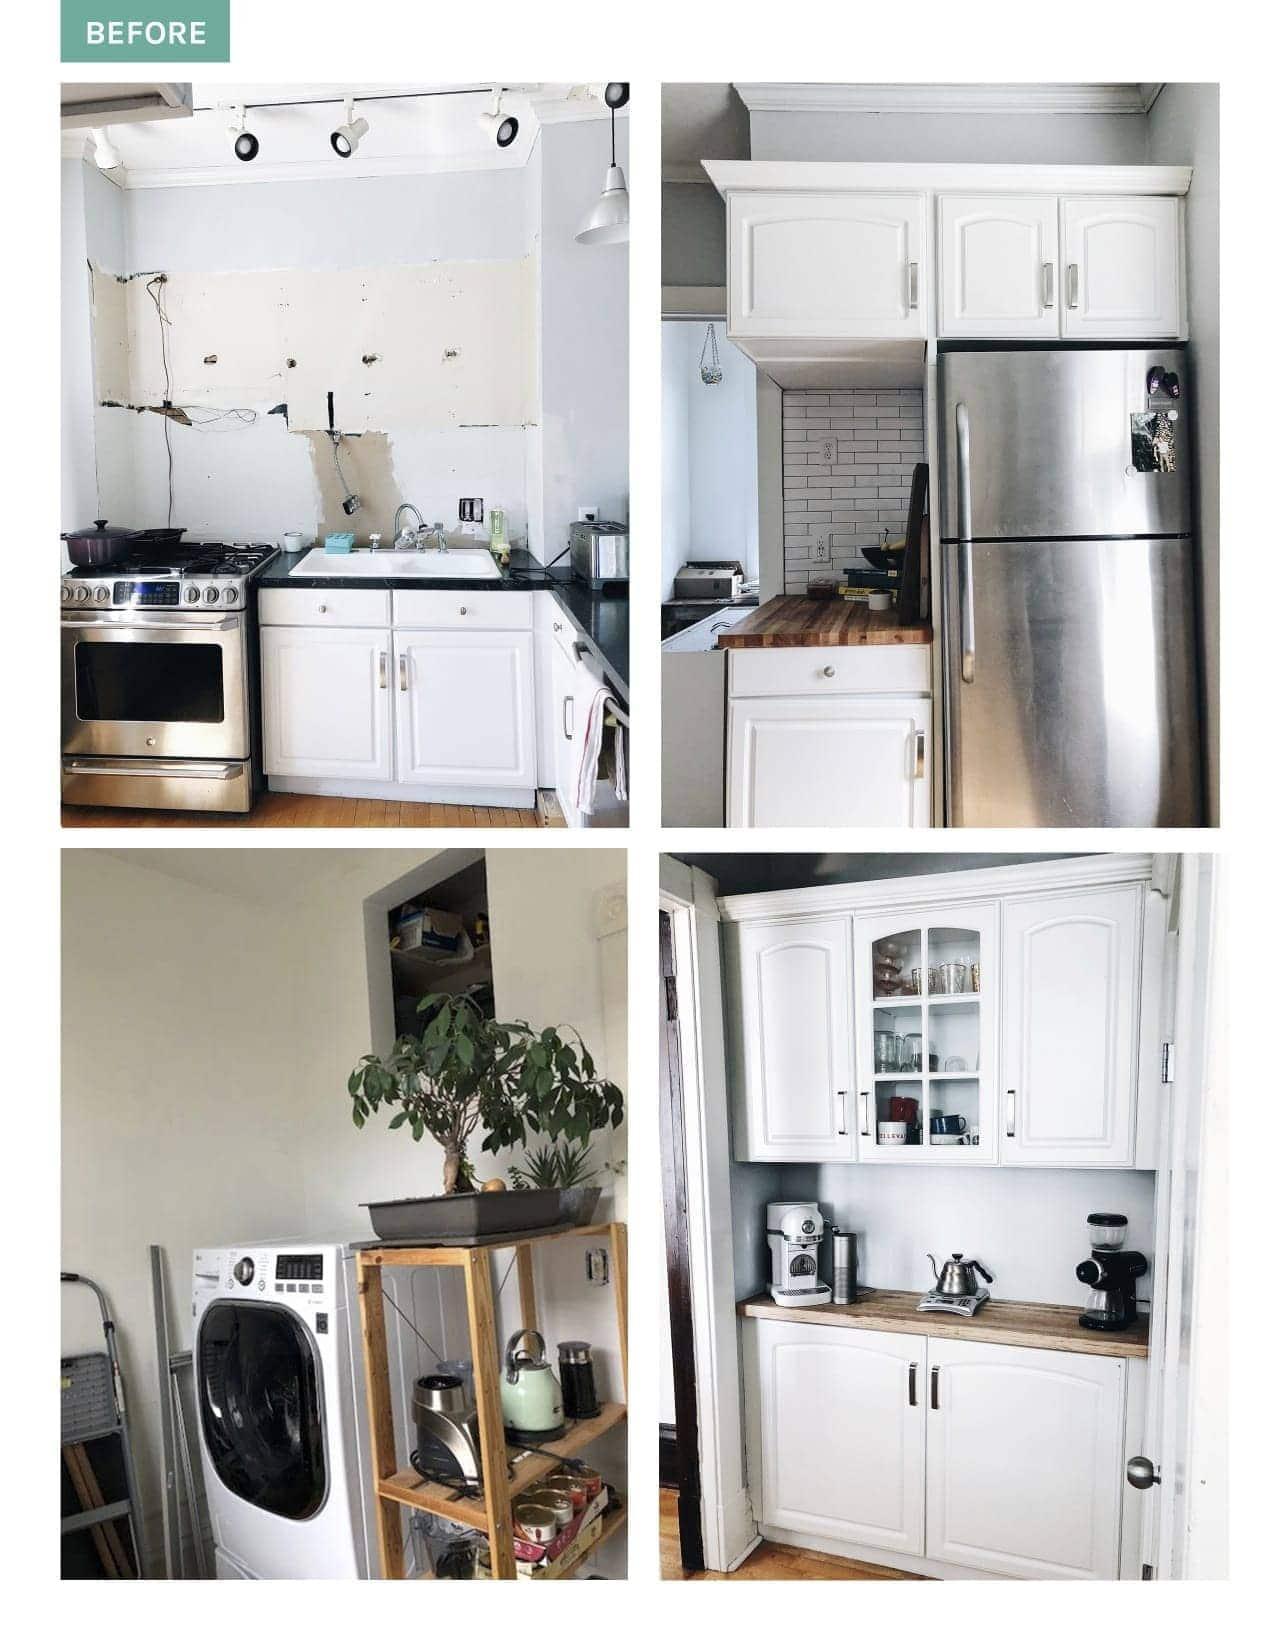 Before photos kitchen renovation